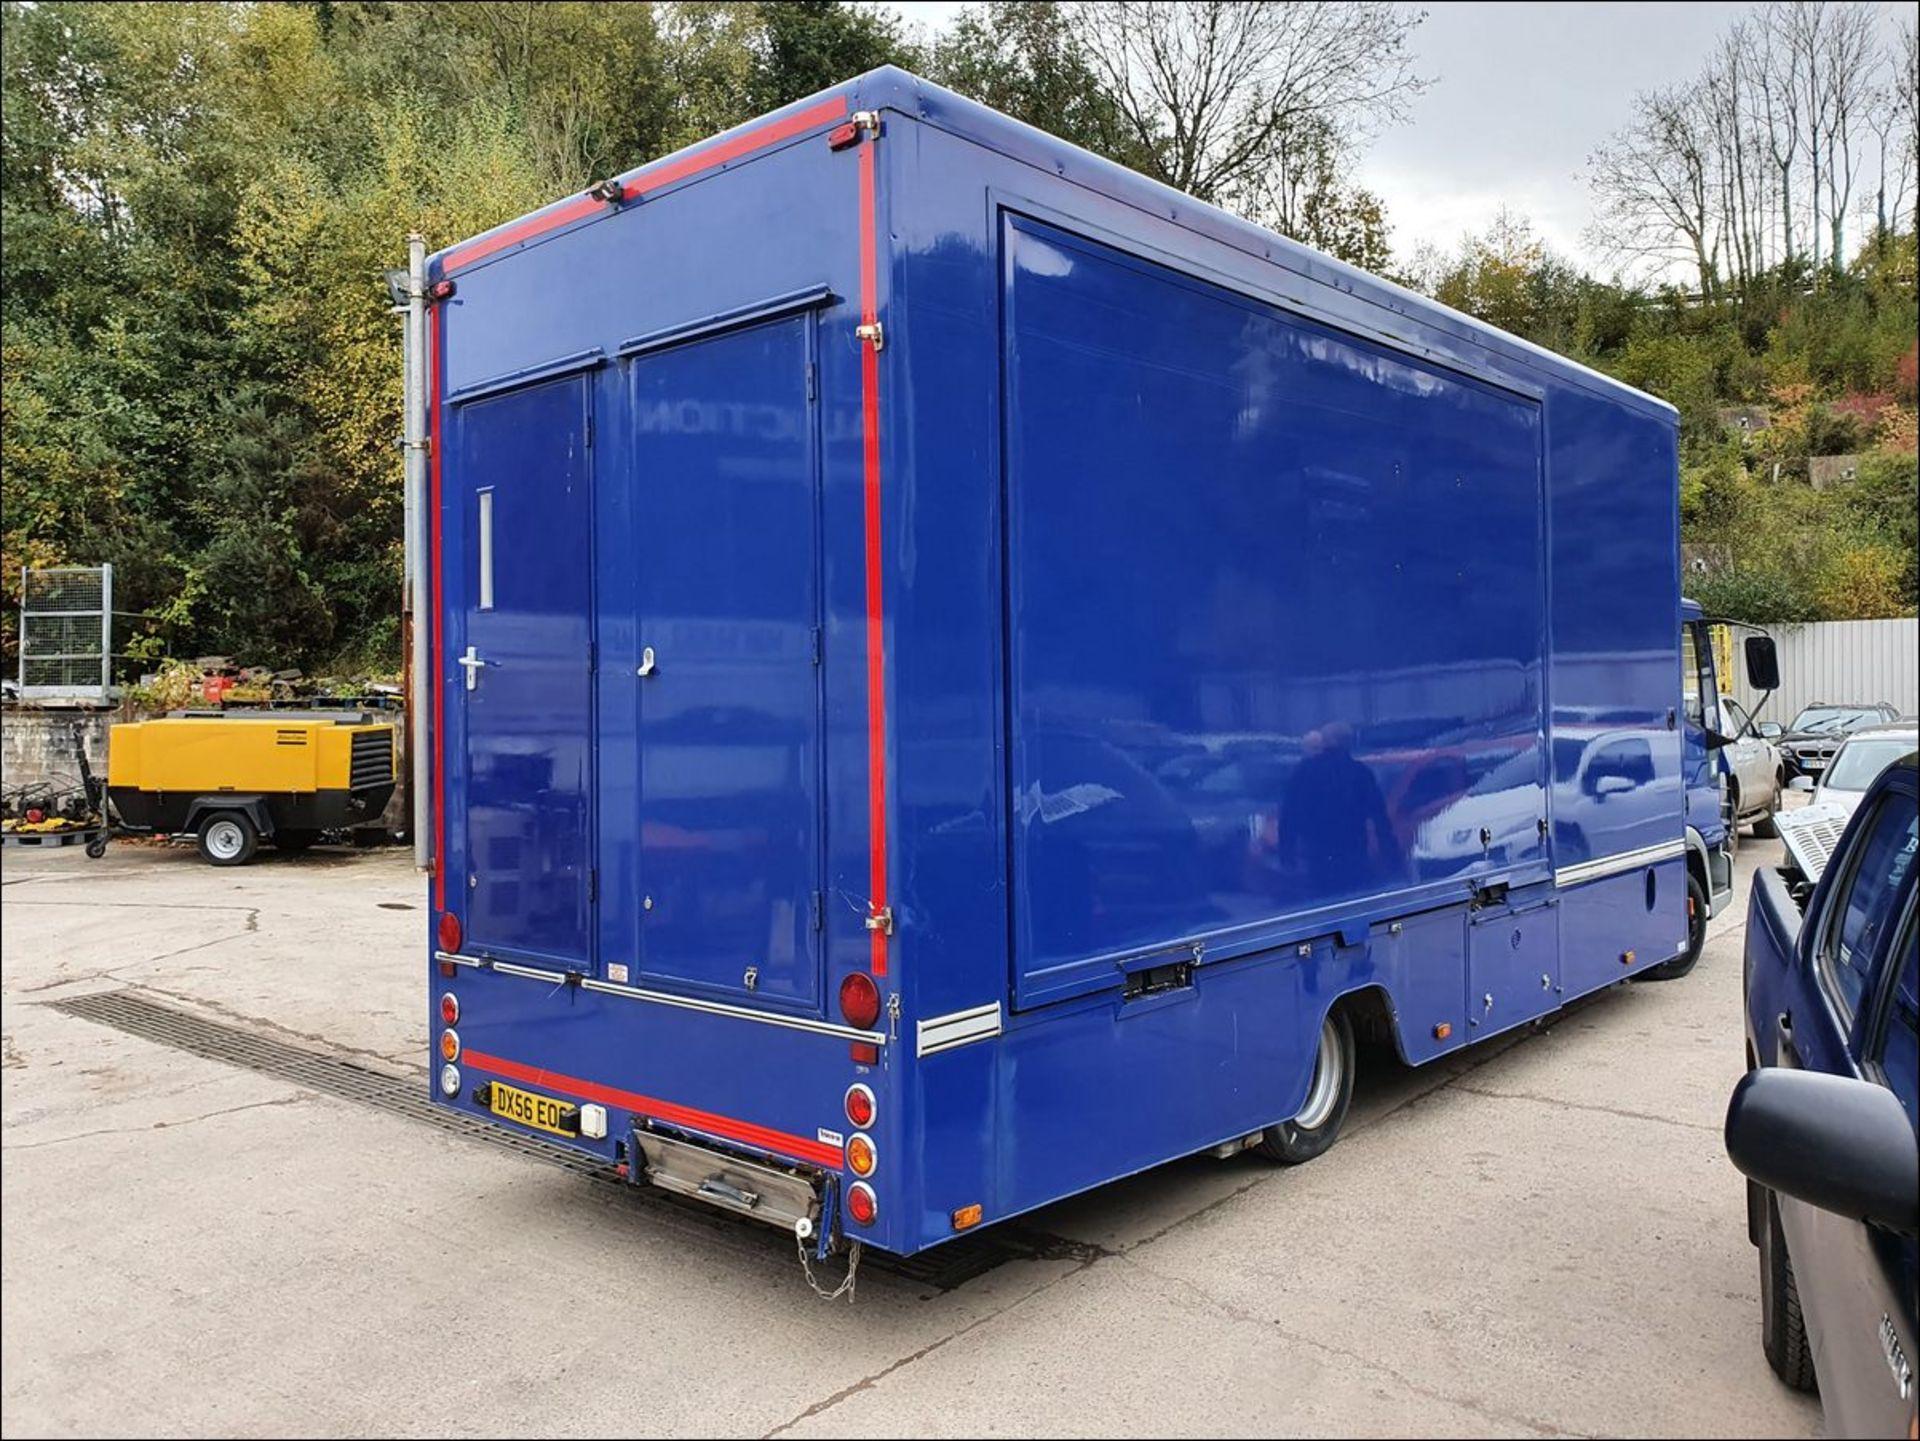 06/56 IVECO EUROCARGO EXHIBITION VEHICLE - 3920cc (Blue, 33k) - Image 5 of 13